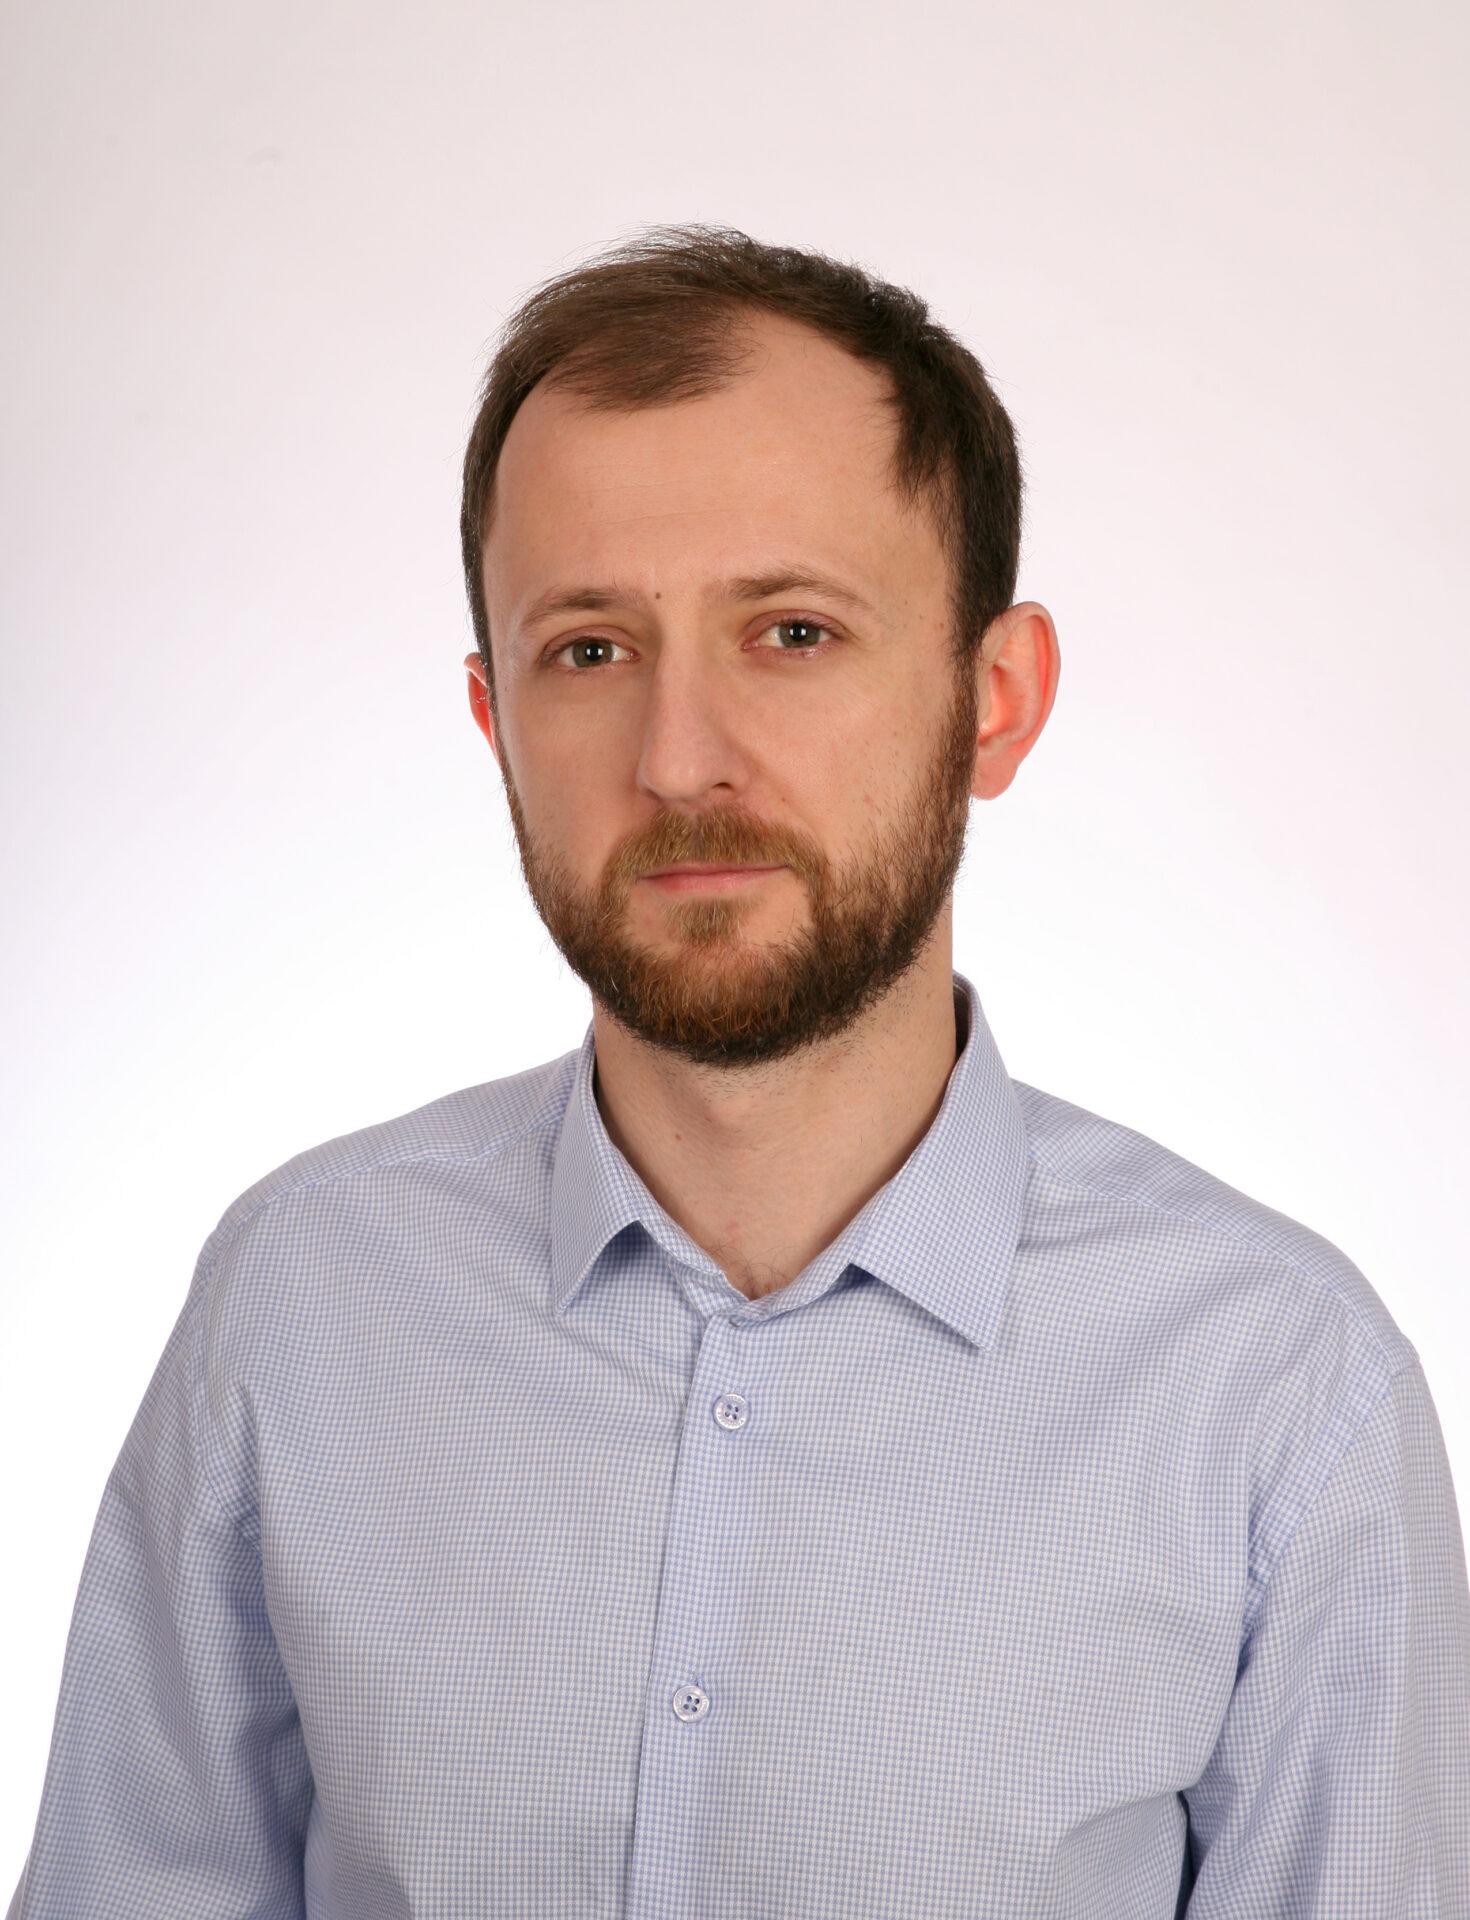 Szymon Wójcik<br /><p>Handlowiec (Trader)